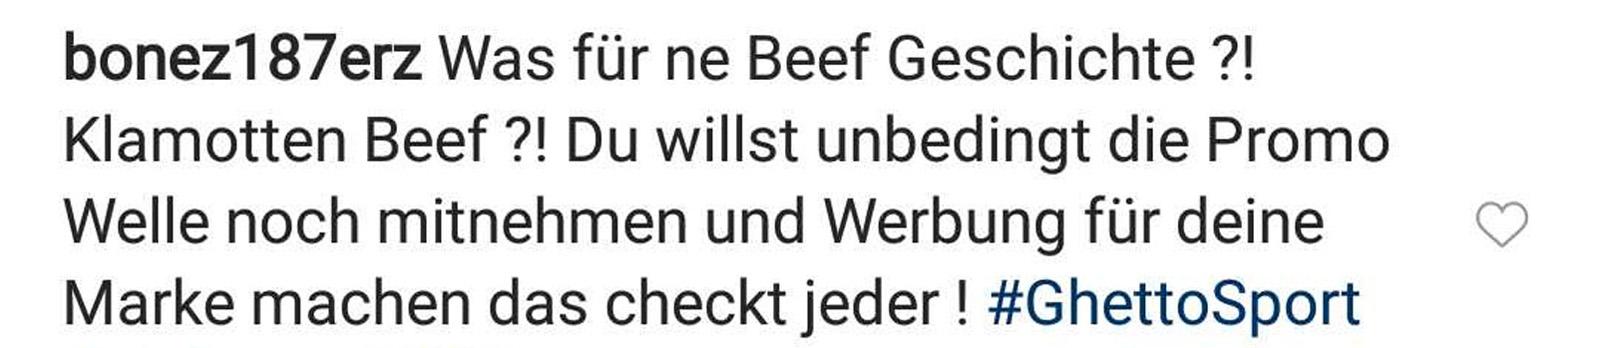 Bonez MC über den Mode-Beef